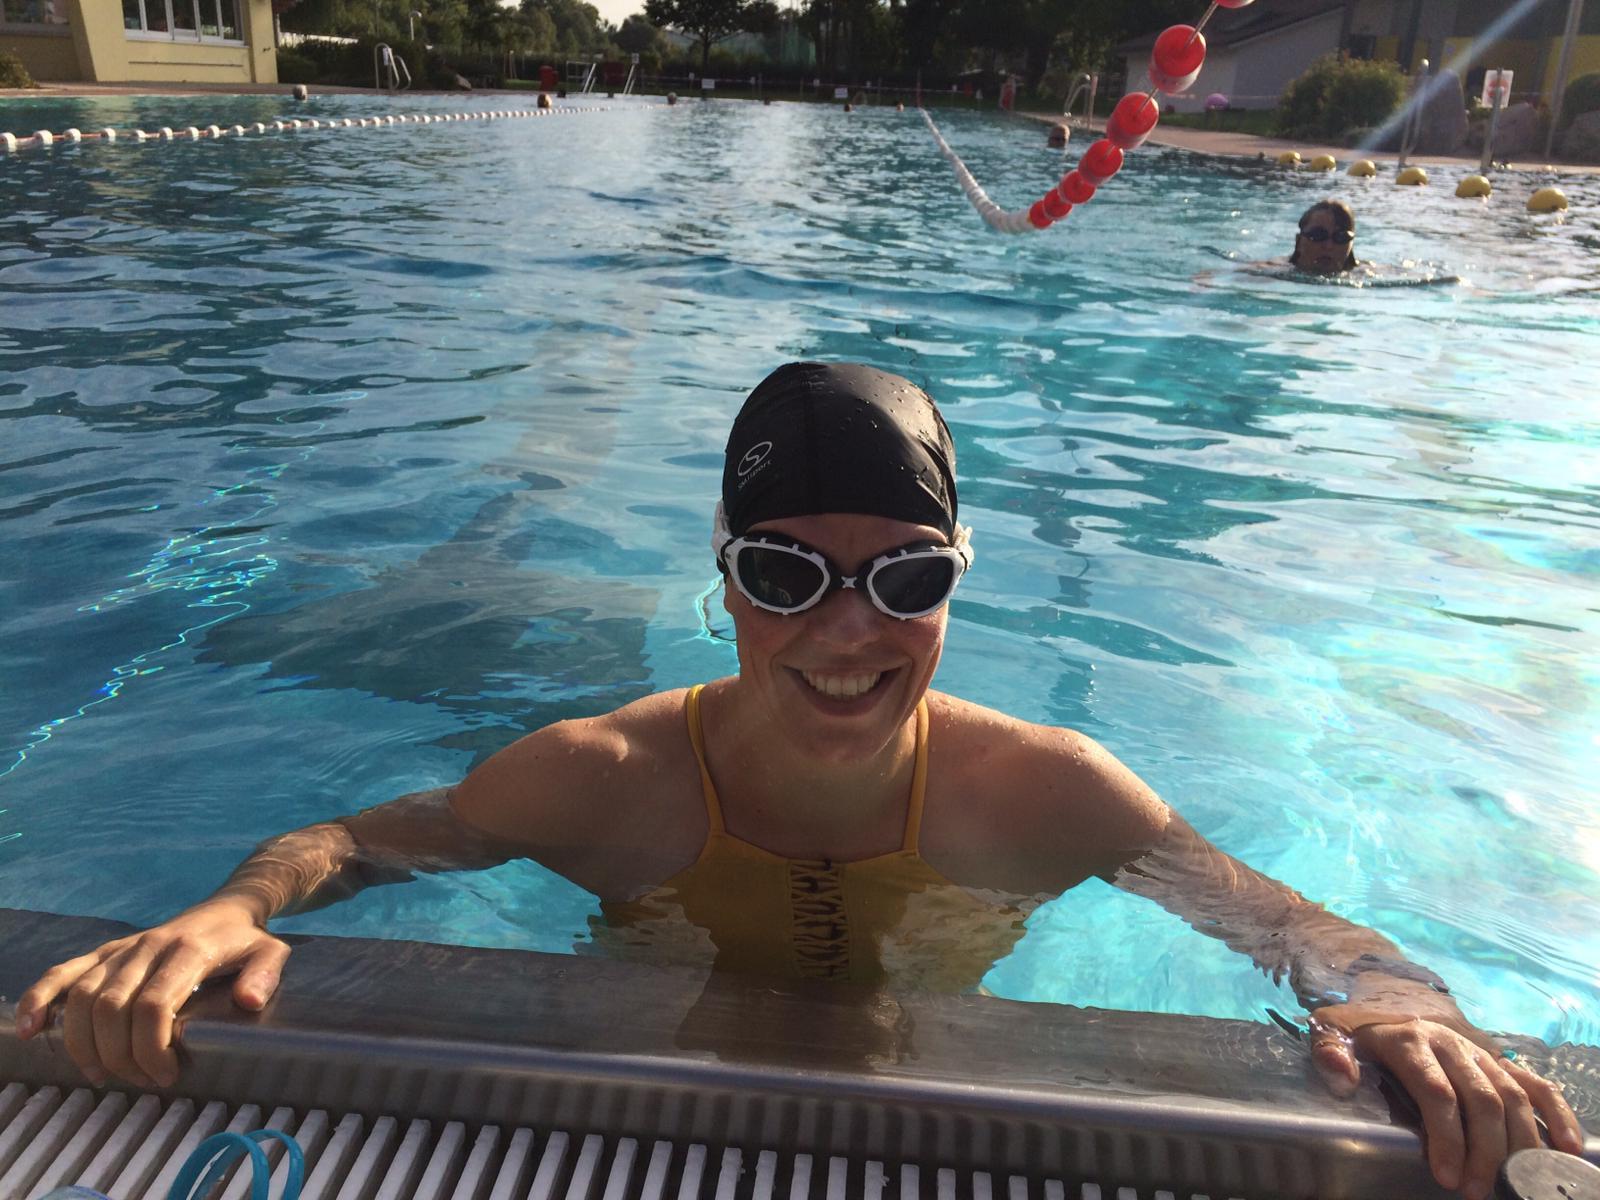 KiKu still goes olympia - Schwimmen